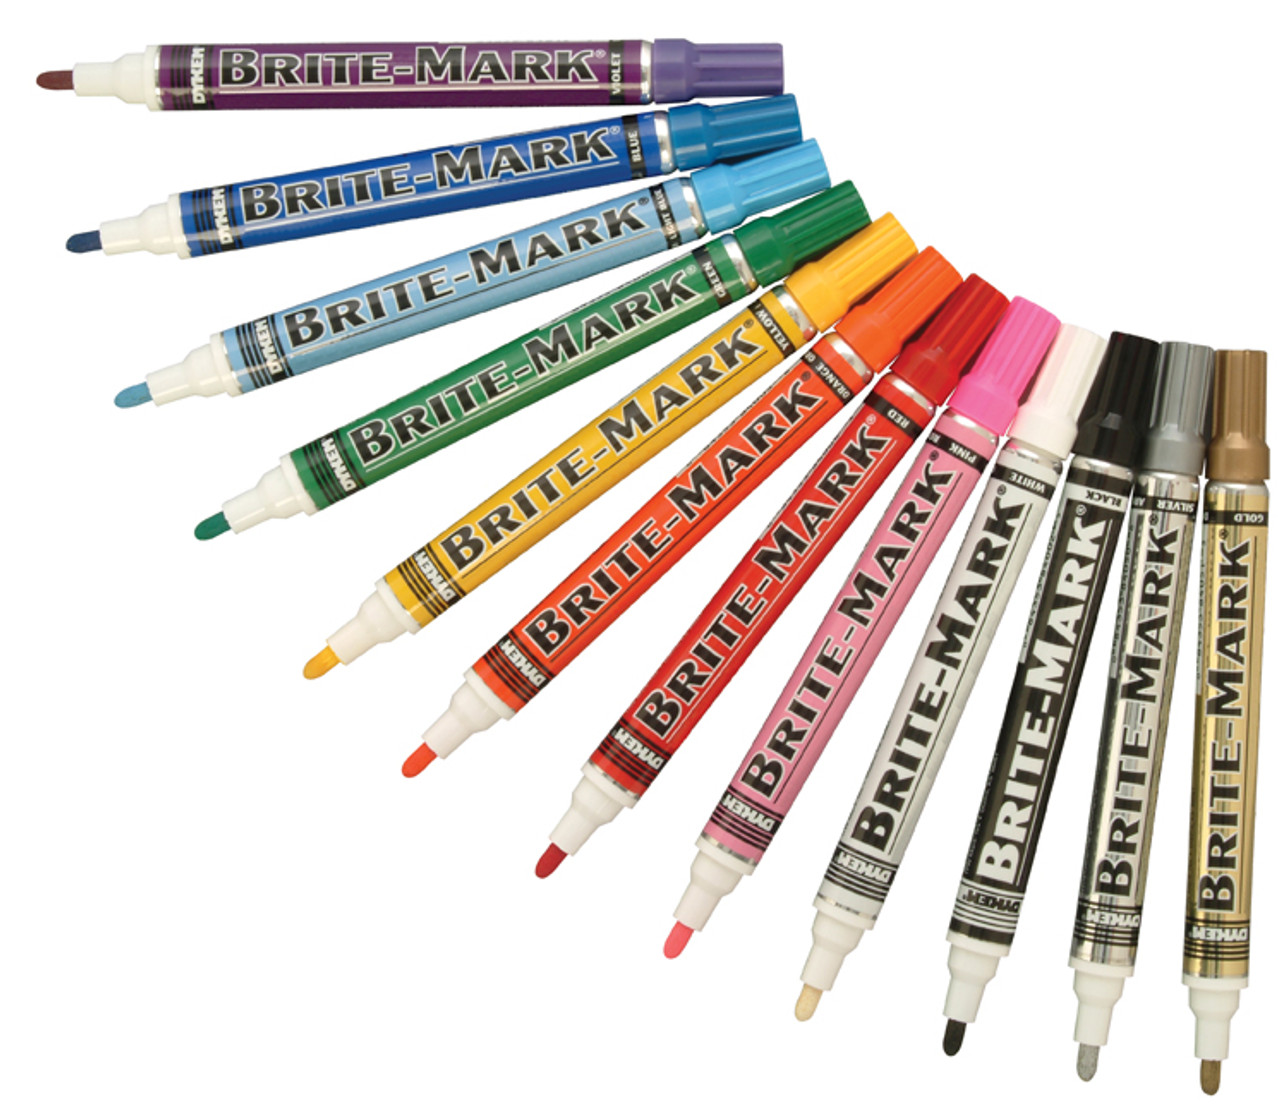 Dykem Brite Mark Medium Valve Action Paint Marker Pen Metal Rubber Plastic Wood